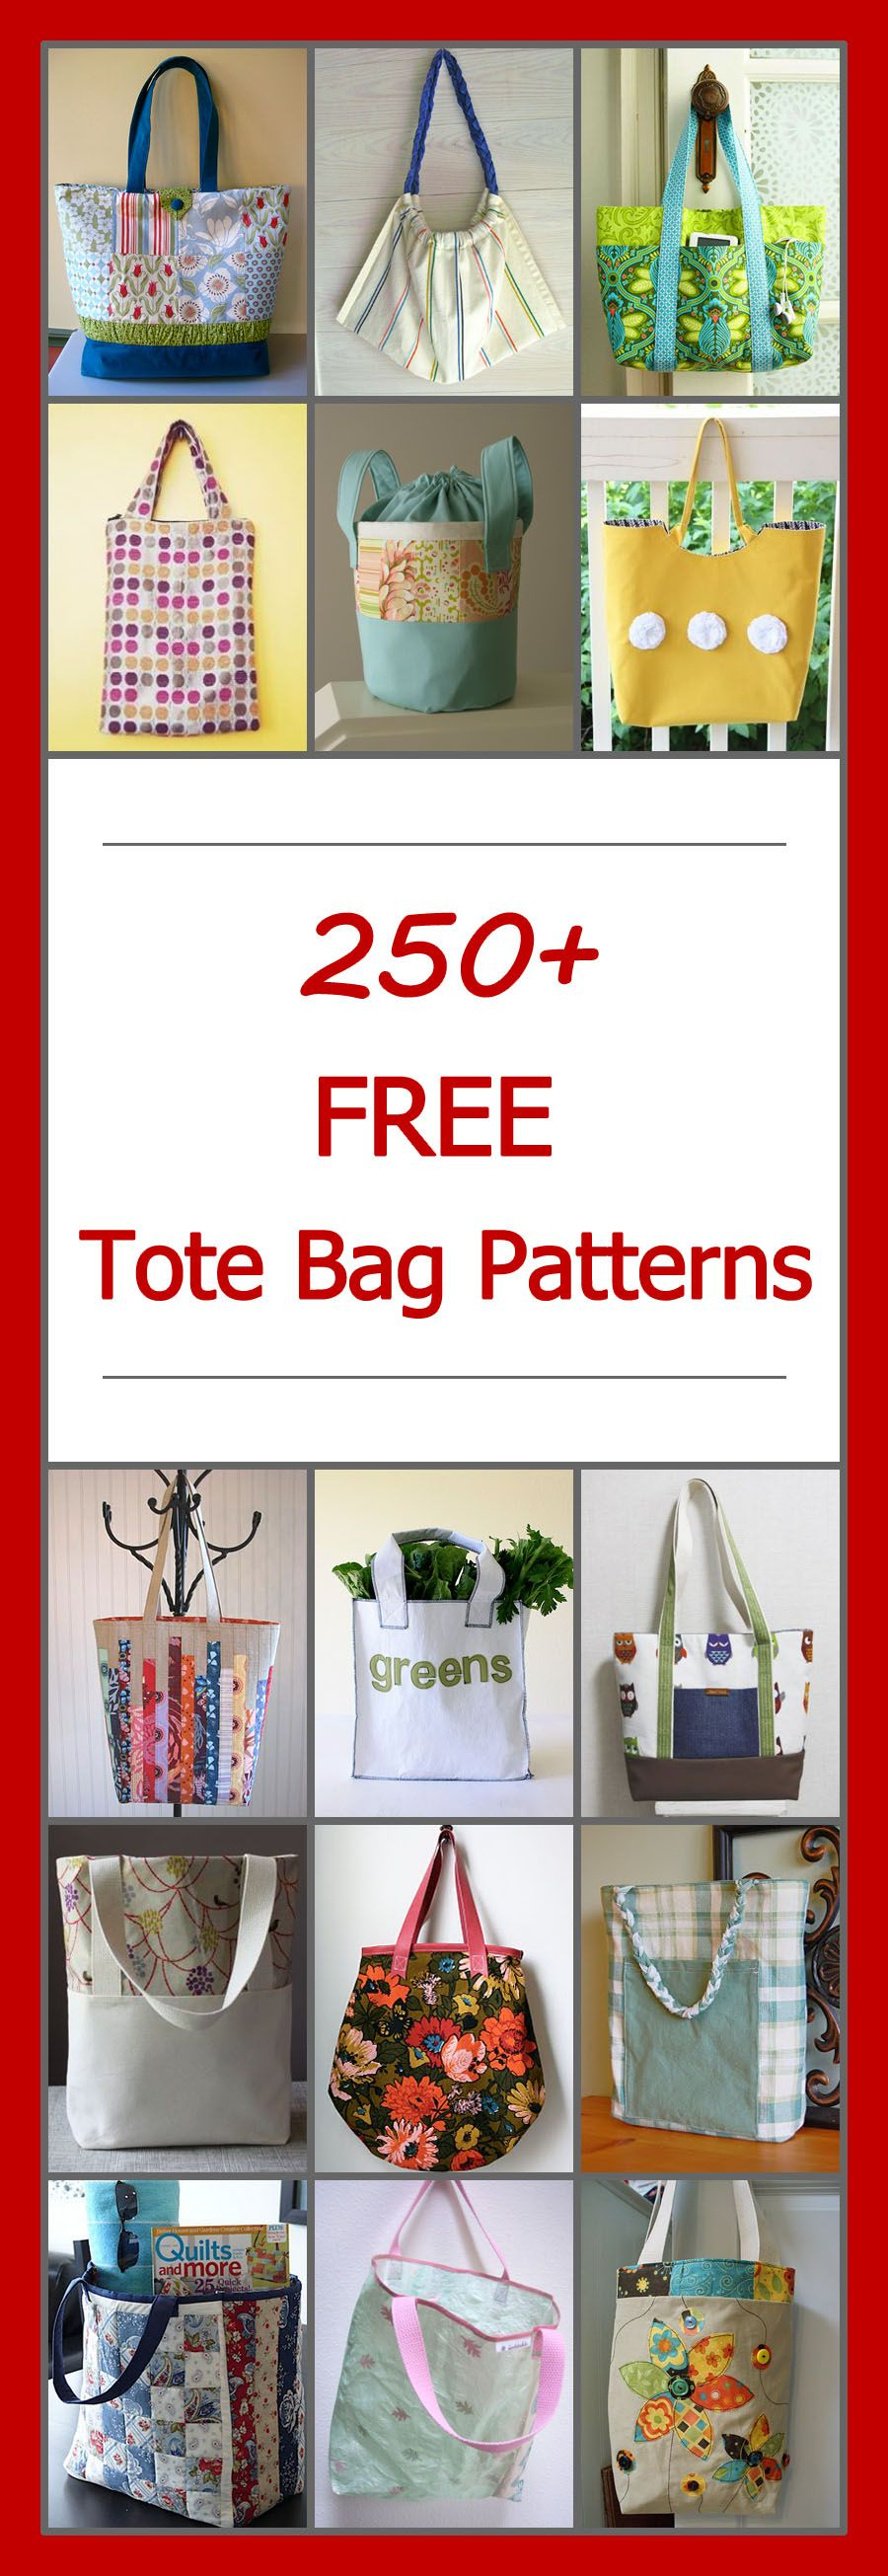 250+ Free Tote Bag Patterns | Bolsos, Costura y Sacos